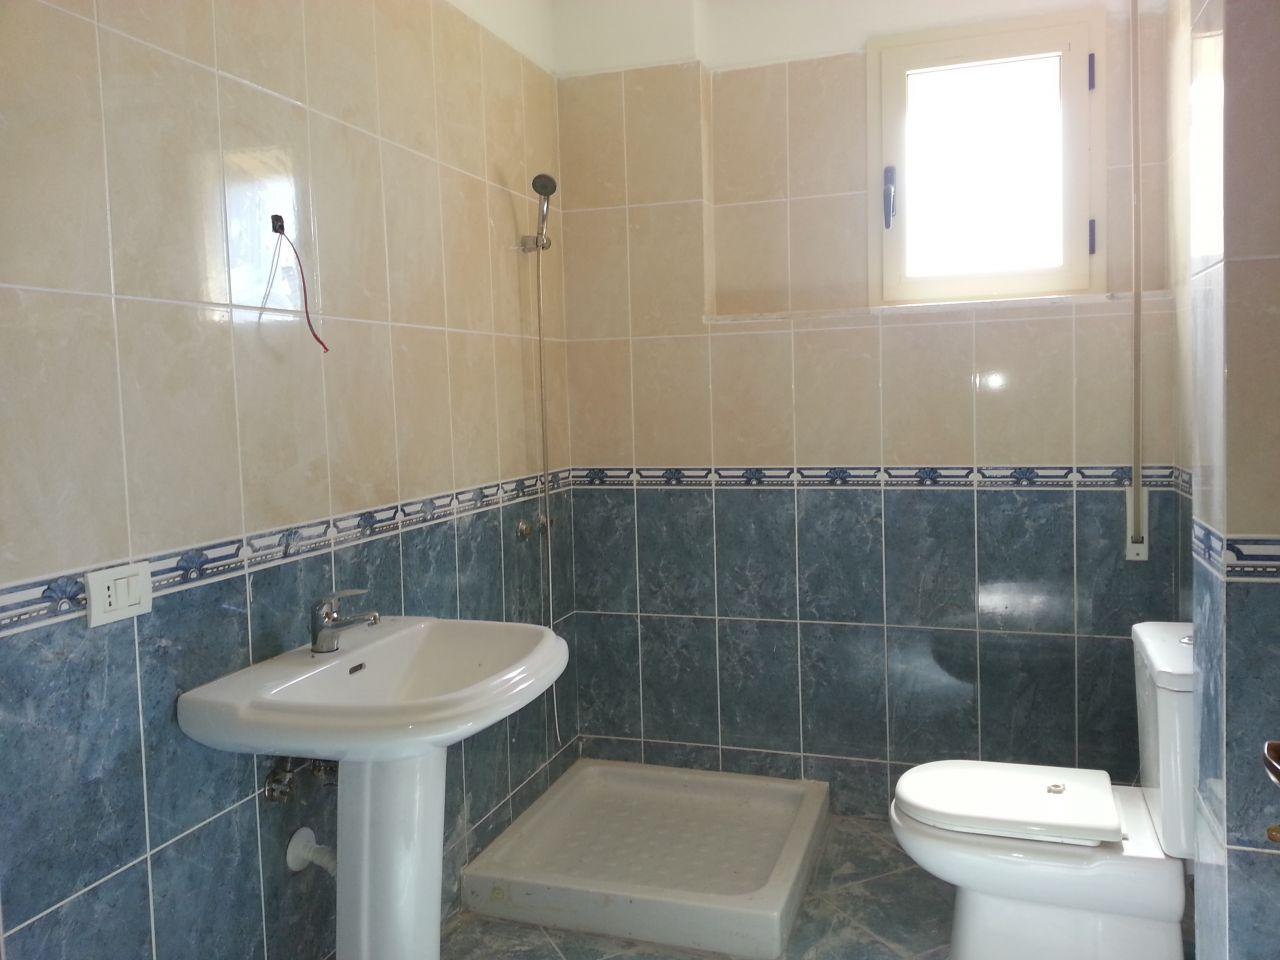 Price - 41600 EURO,  Apartment for Sale - 73 m2